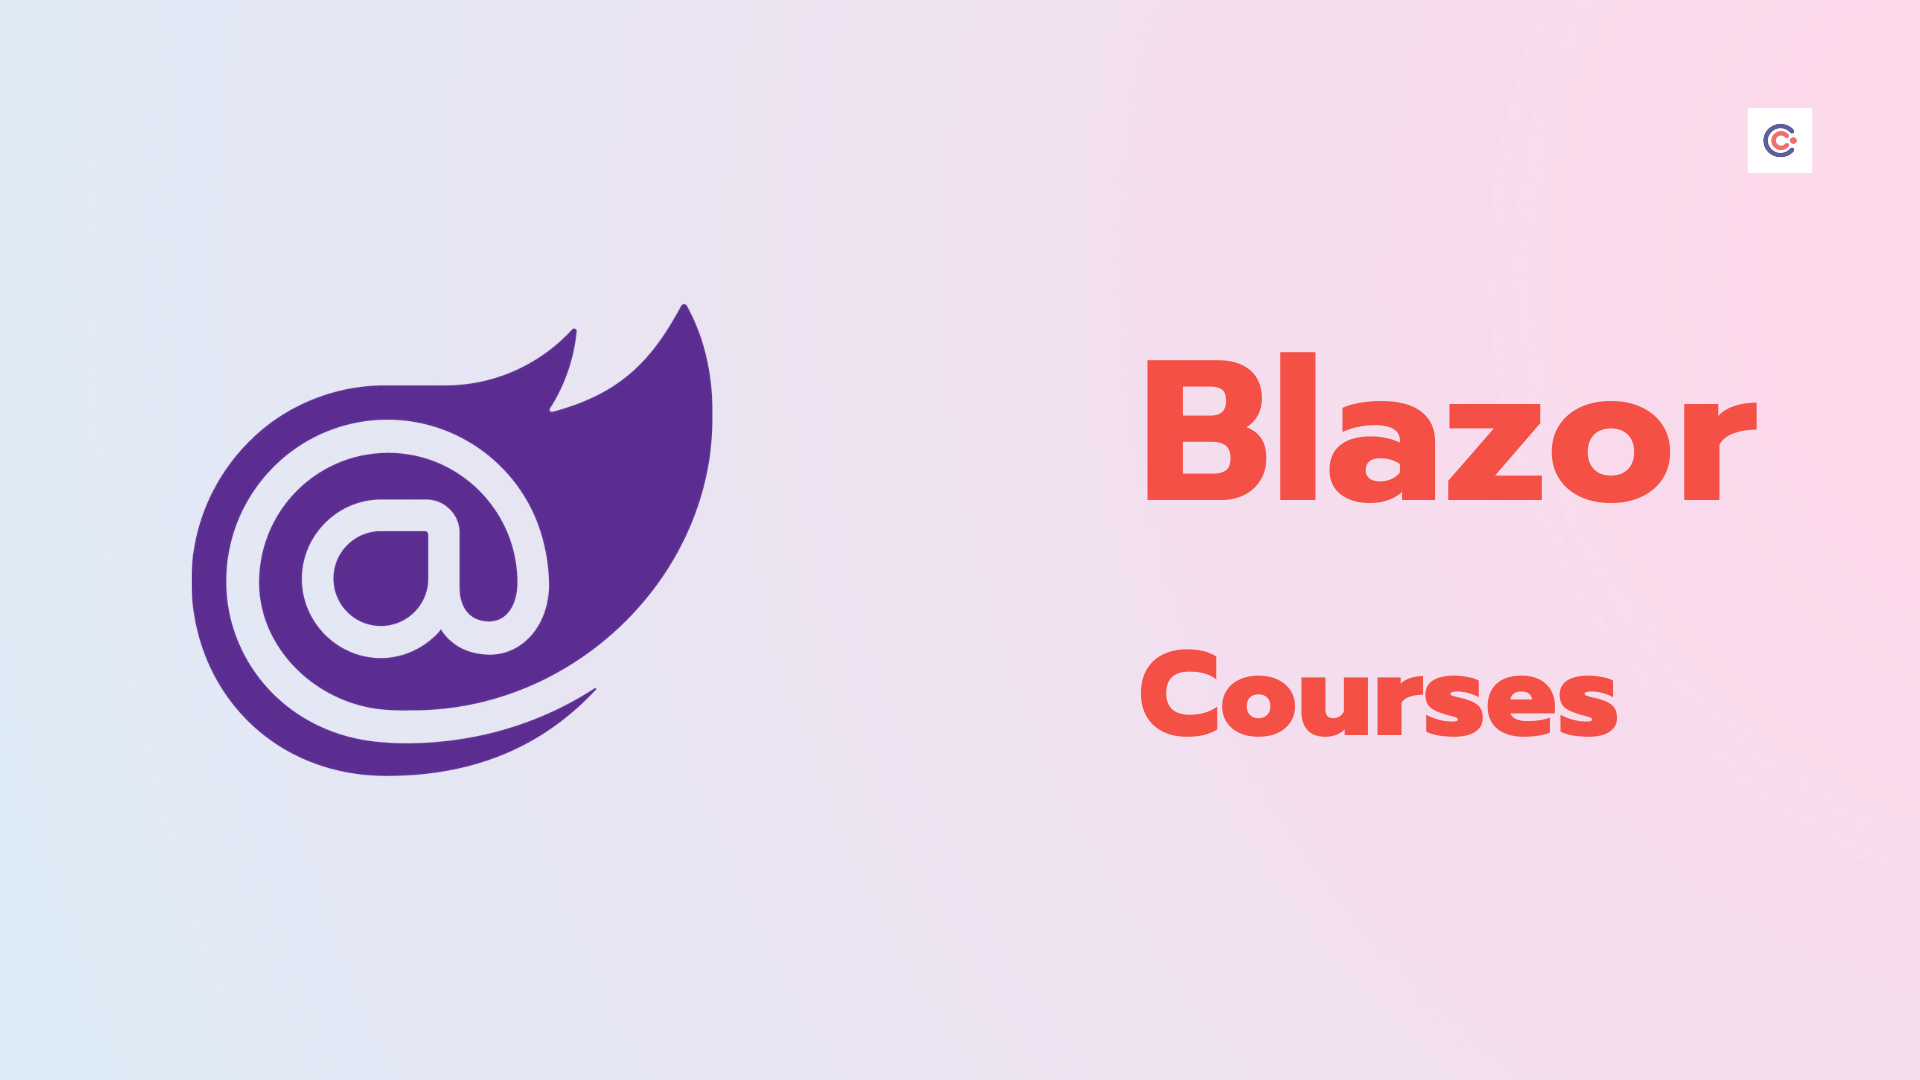 8 Best Blazor Courses and Tutorials - Learn Blazor Online